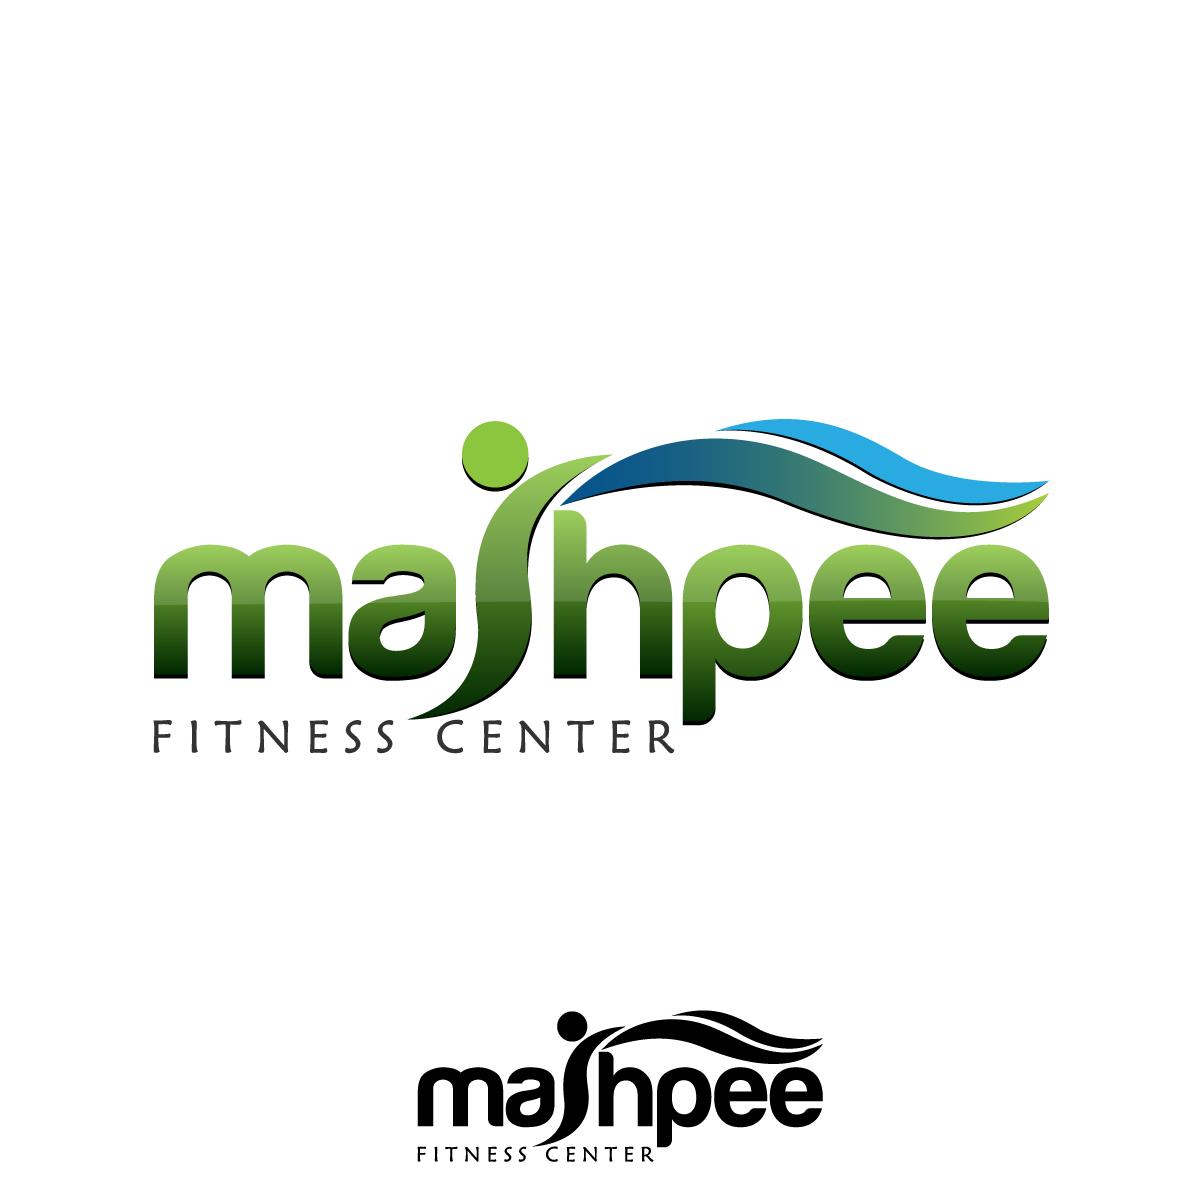 Logo Design by rockin - Entry No. 7 in the Logo Design Contest New Logo Design for Mashpee Fitness Center.